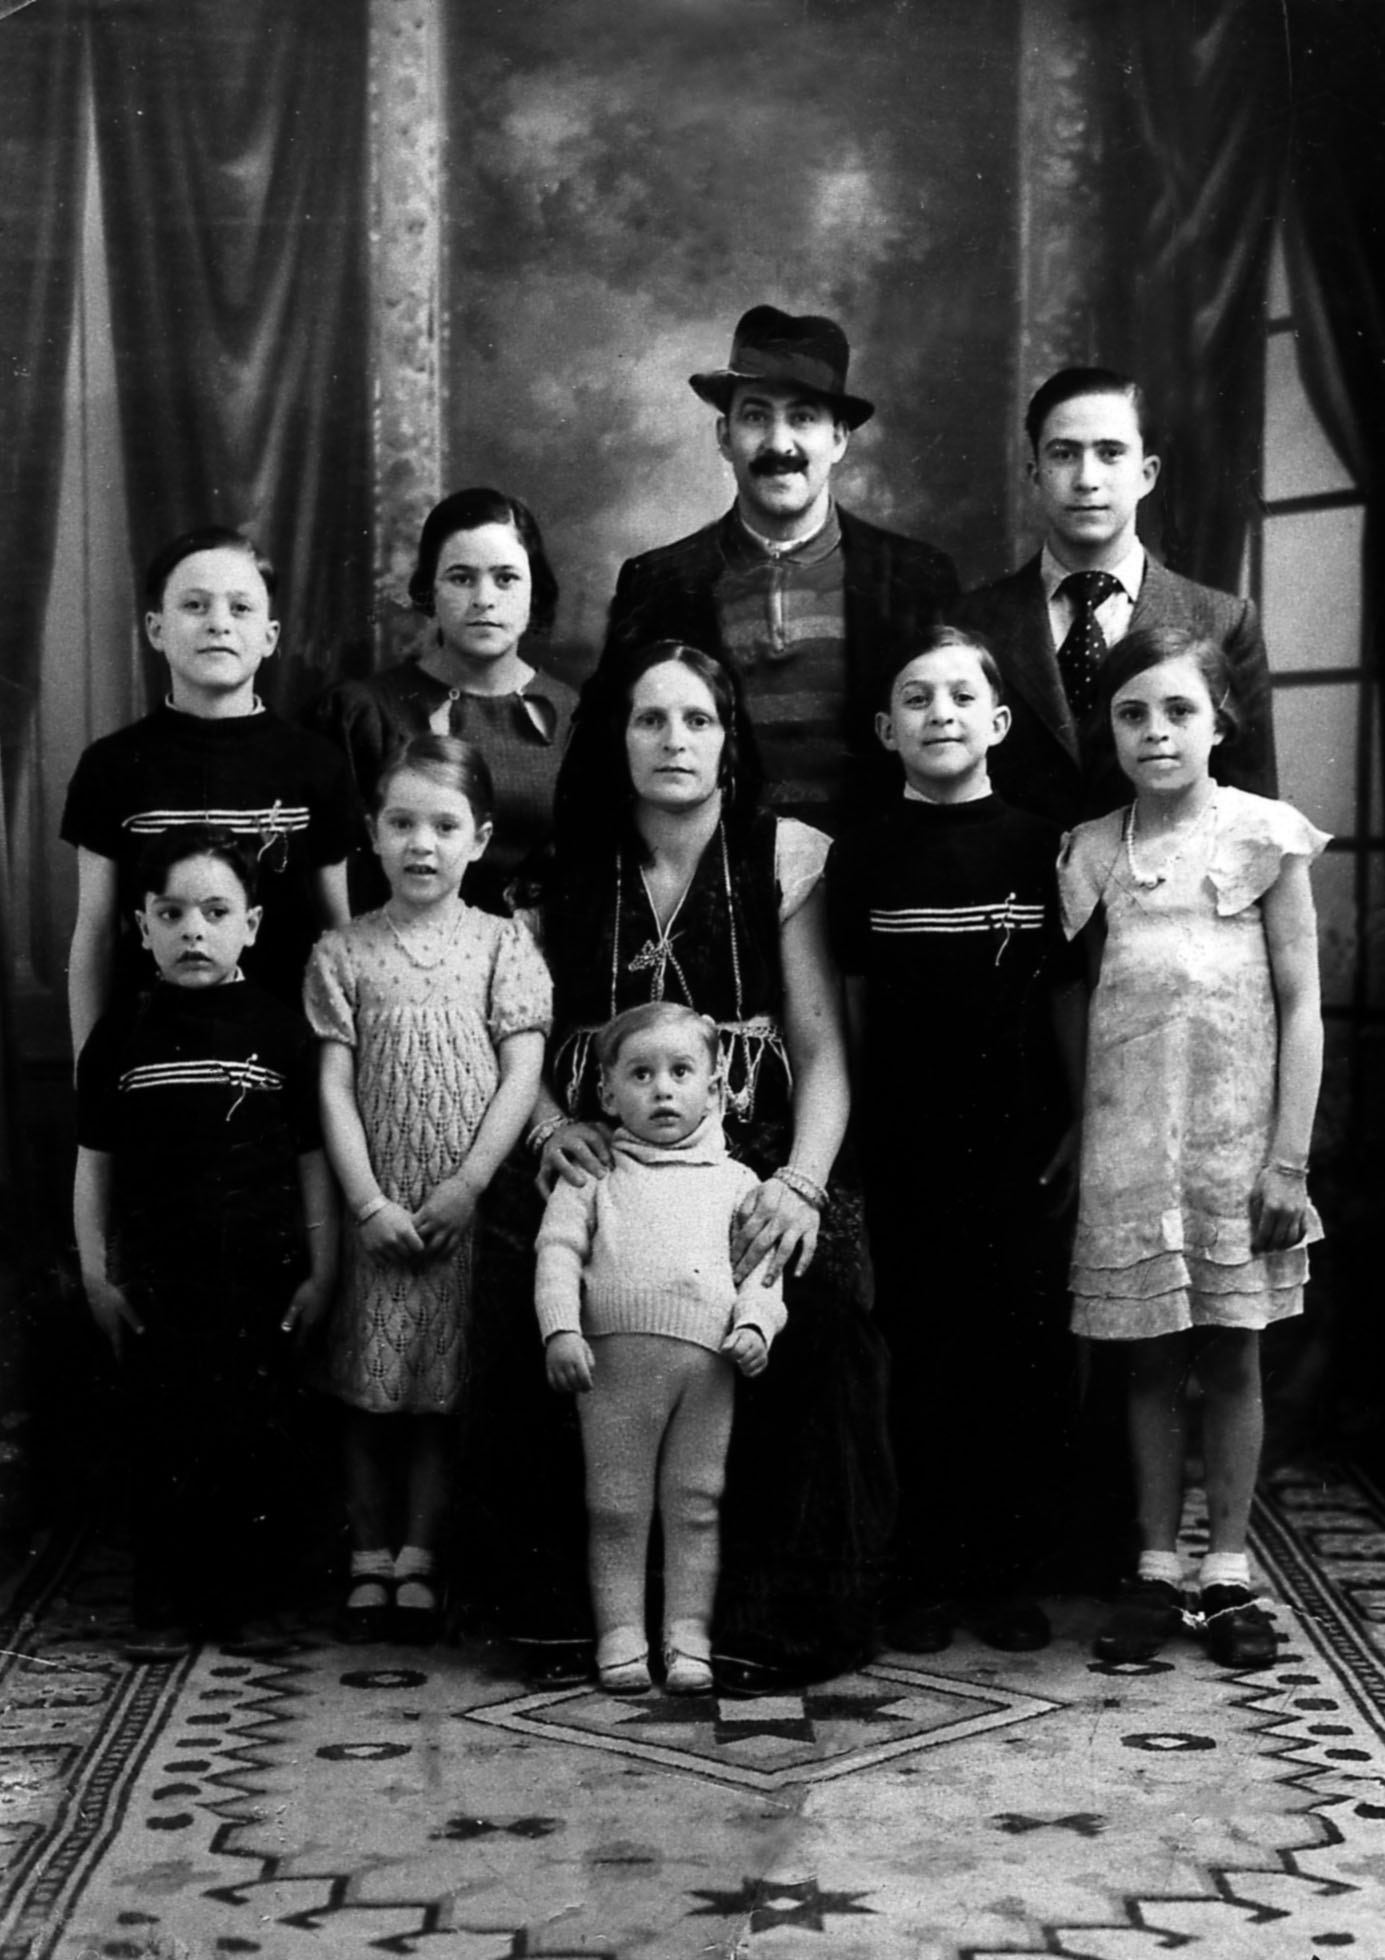 non juif Guy datant fille juive